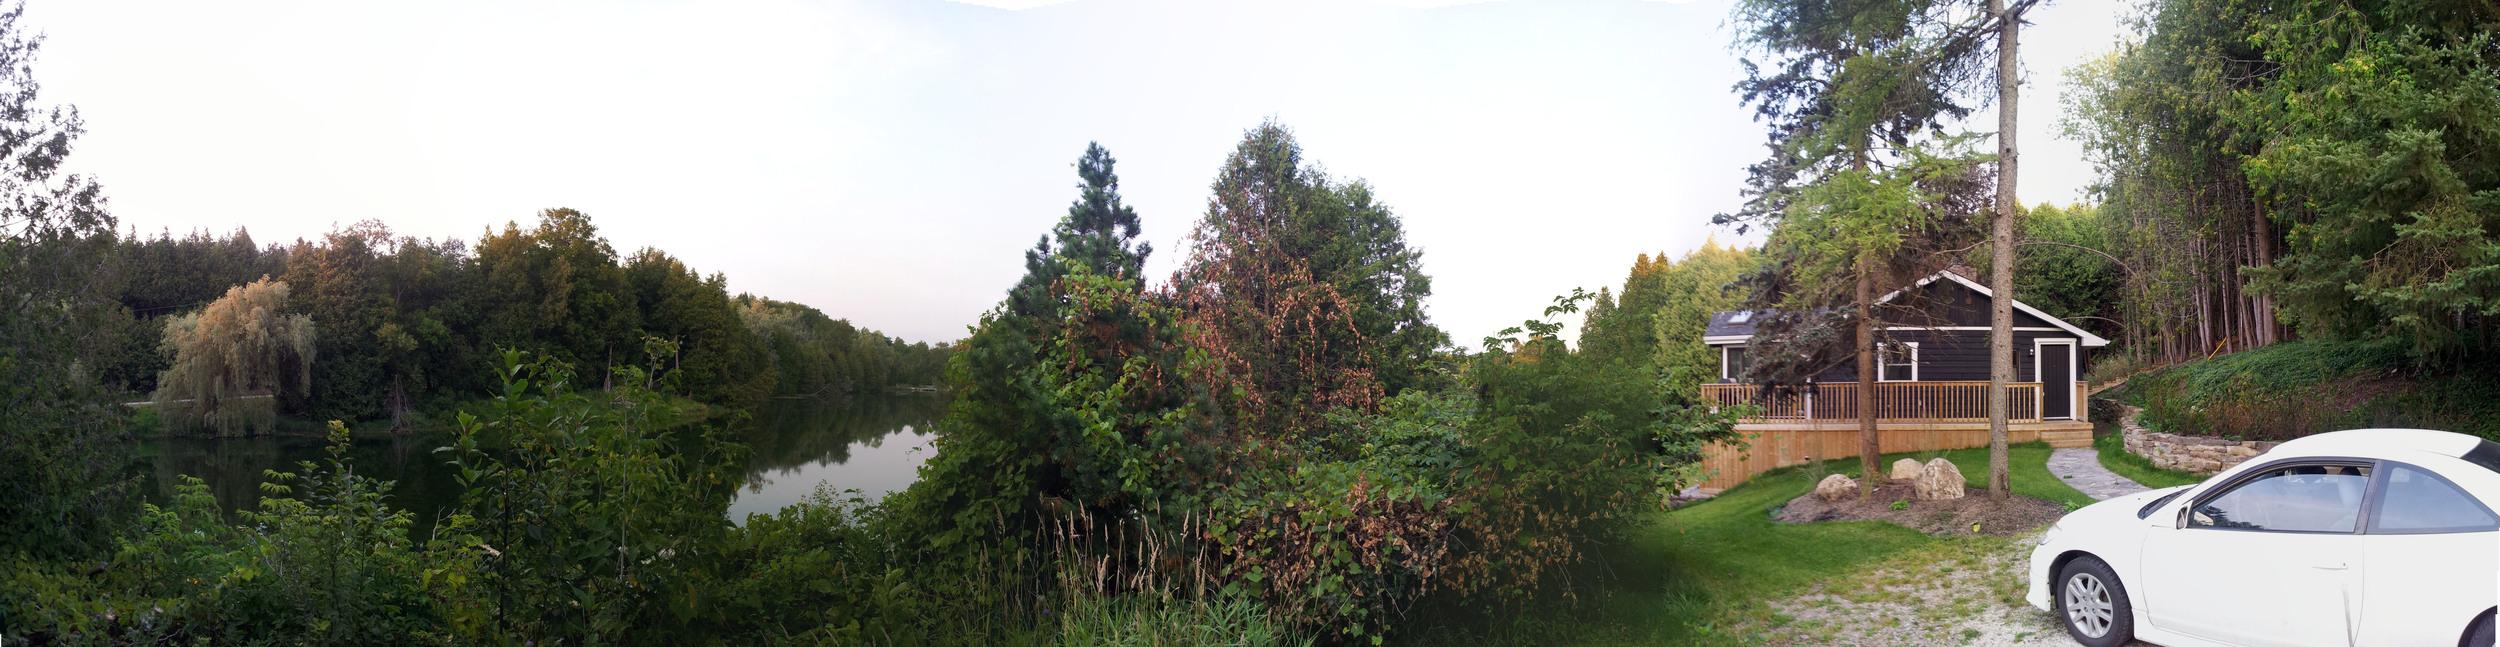 Untitled_Panorama5.jpg